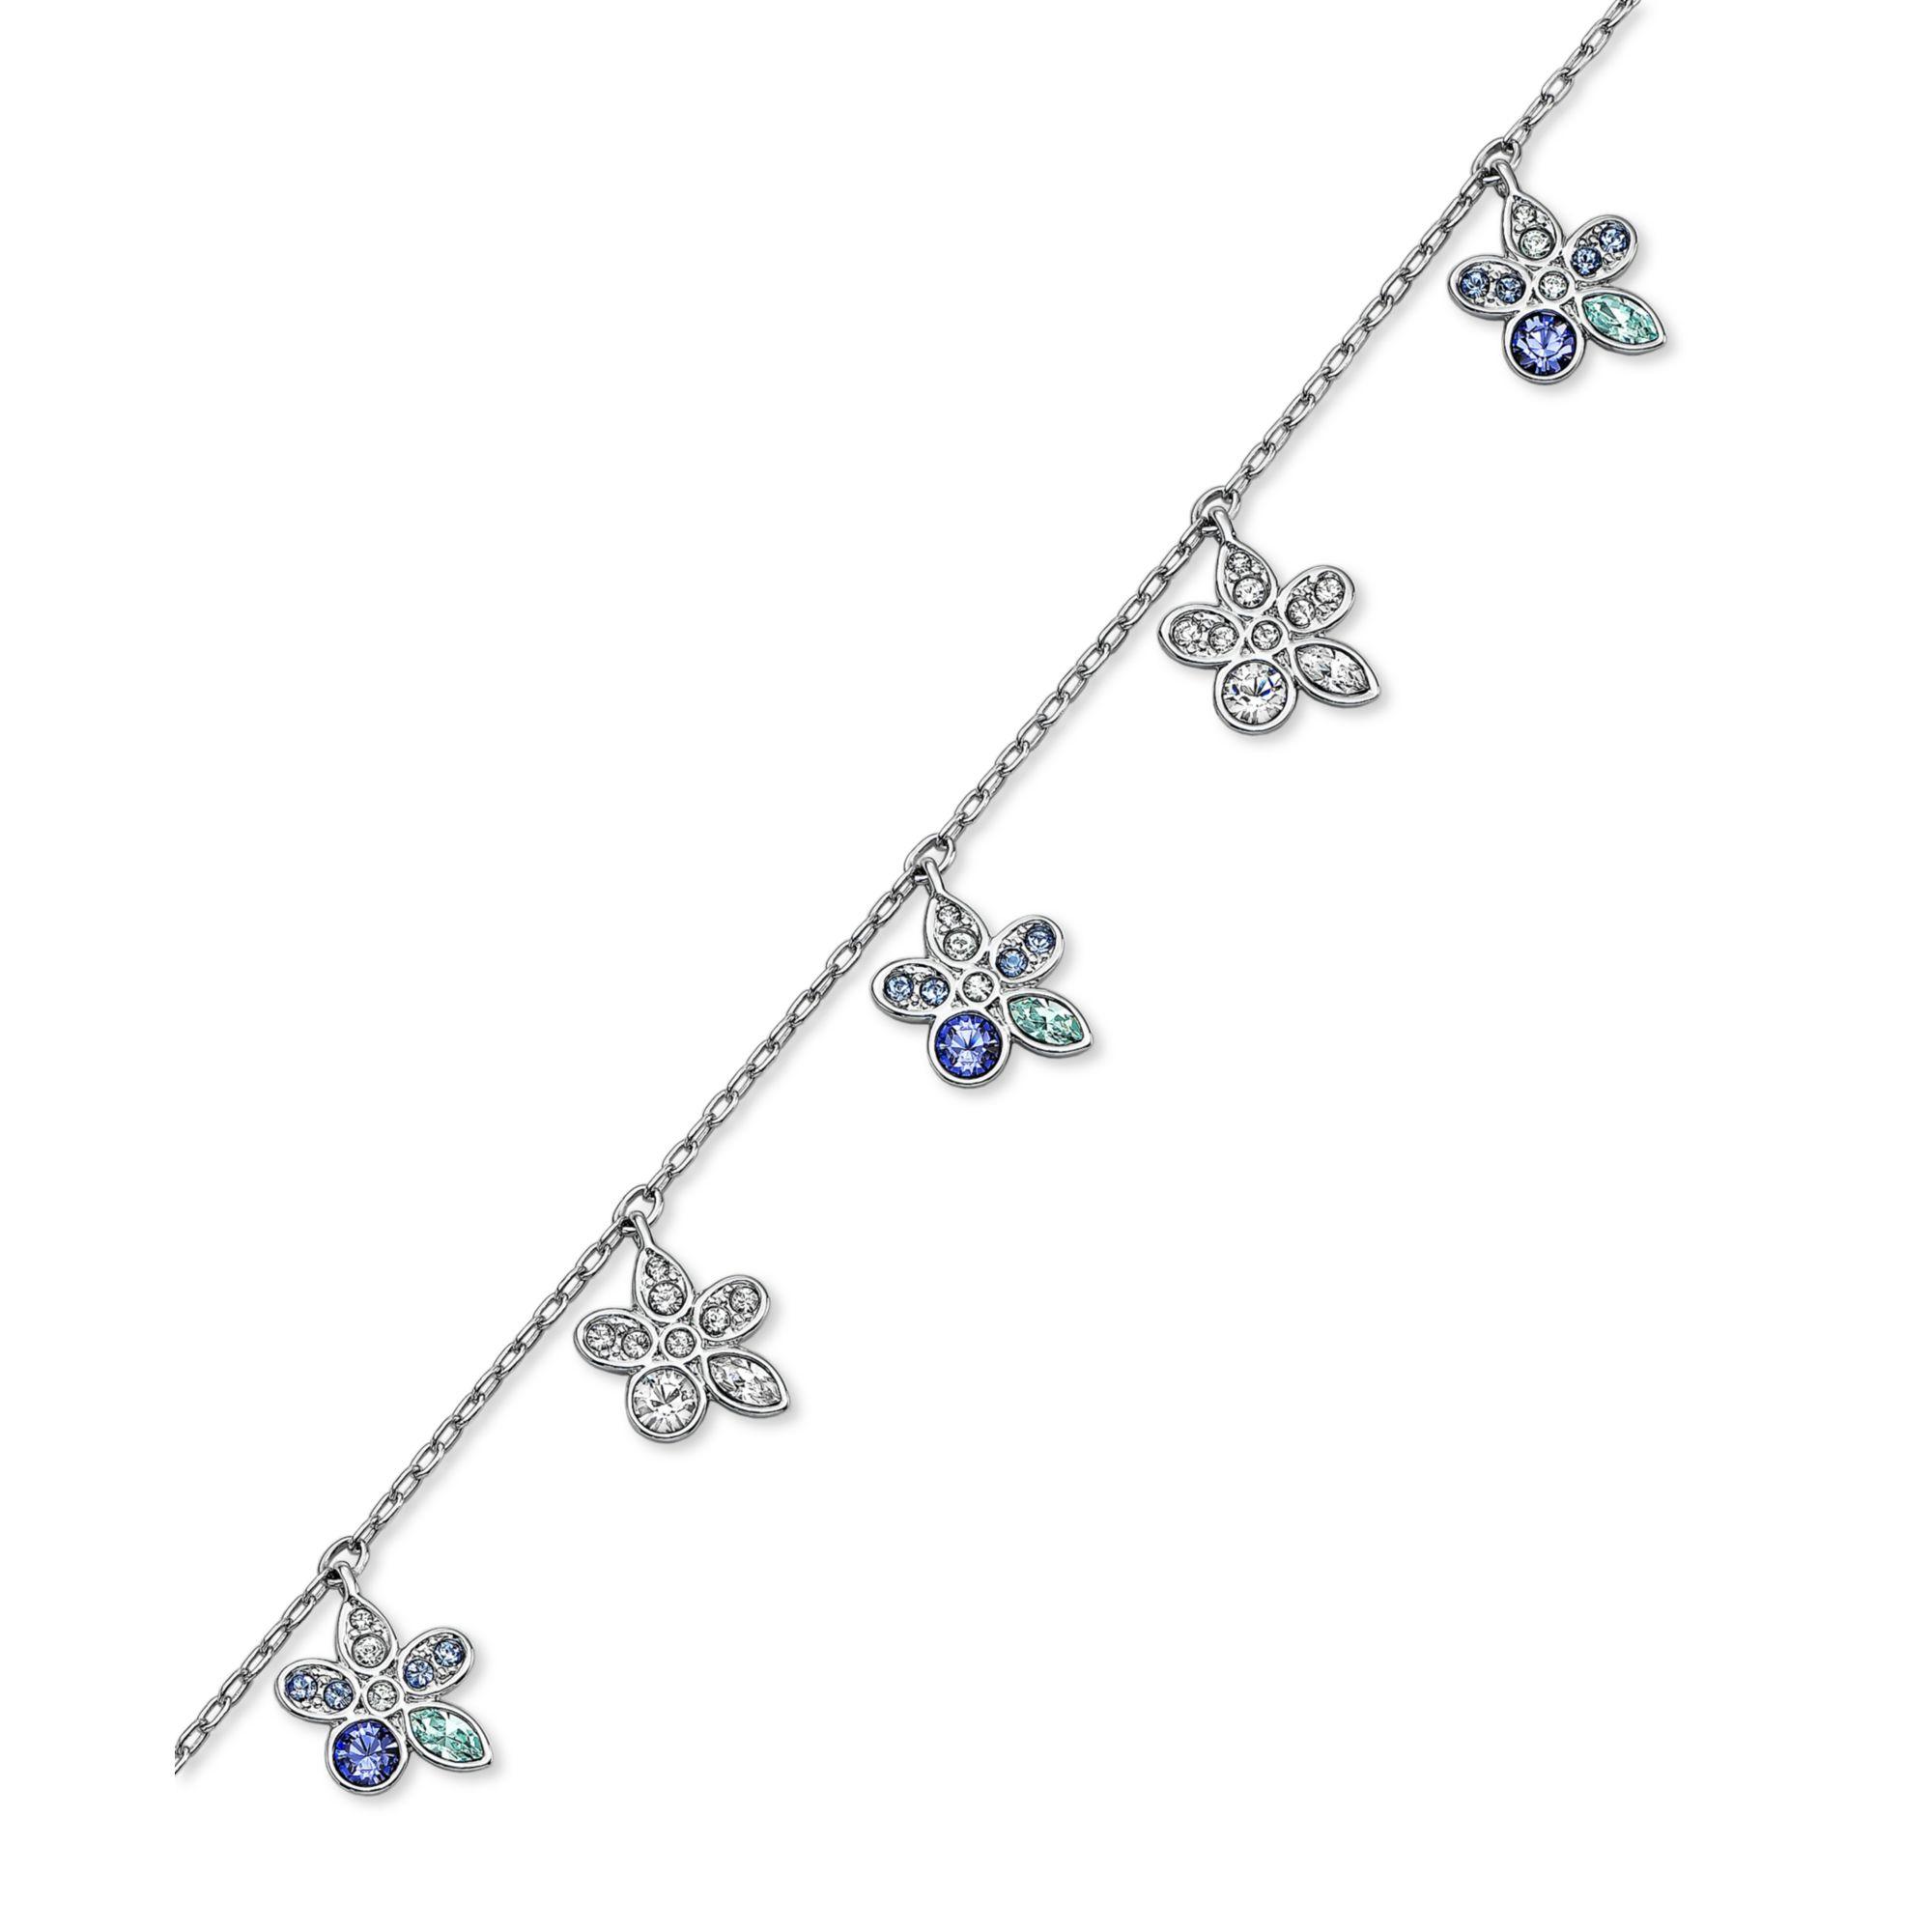 Swarovski White Rhodiumplated Crystal Pave Flower Charm Bracelet